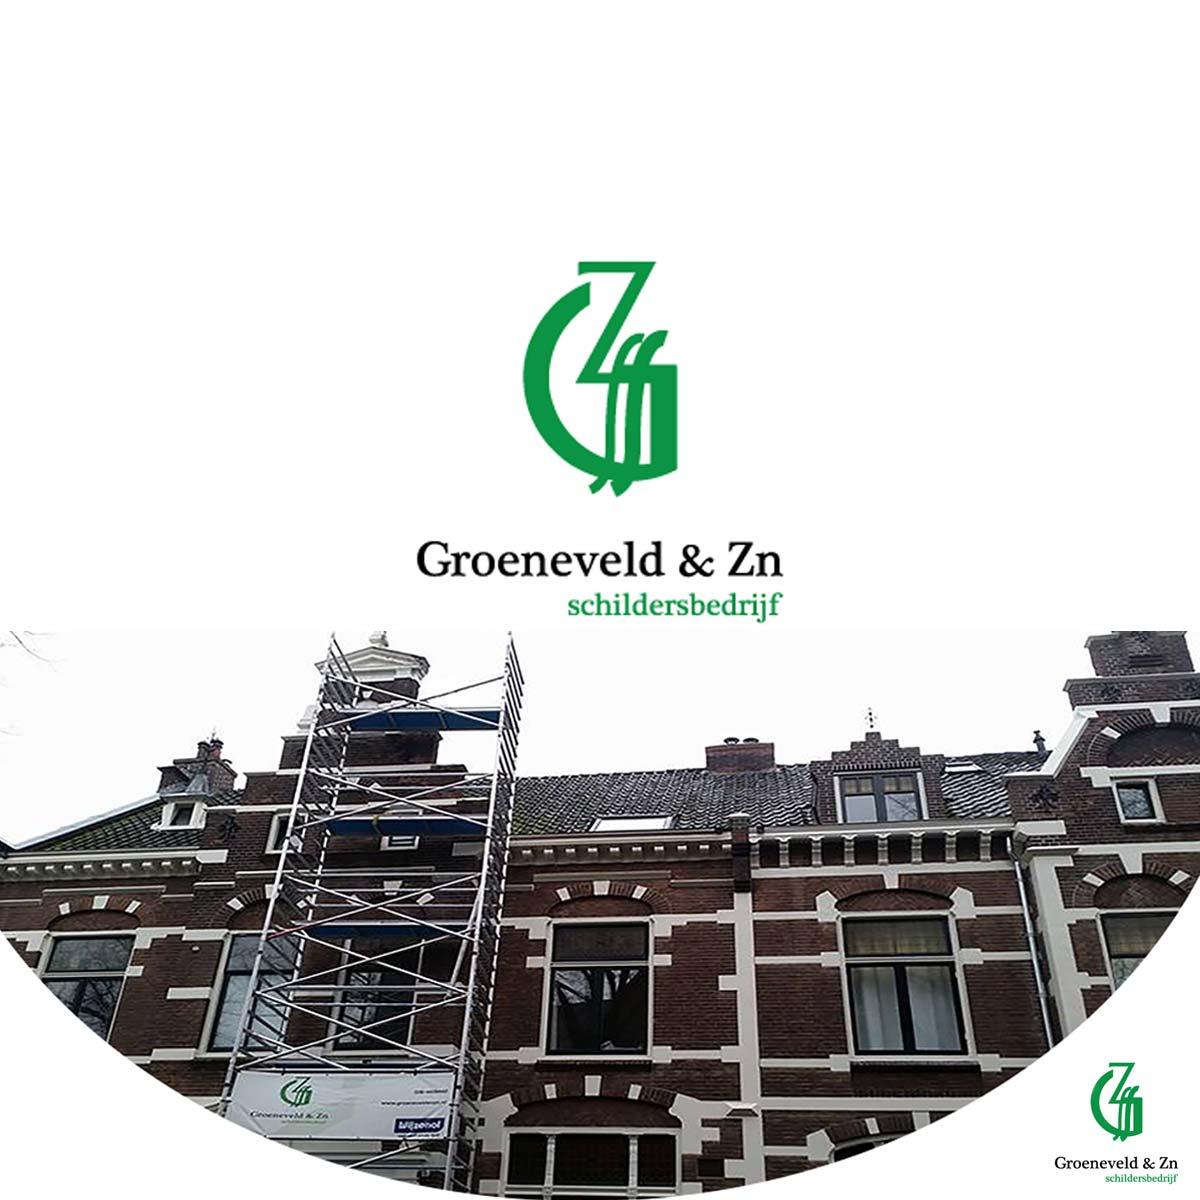 Schildersbedrijf Groeneveld & Zn